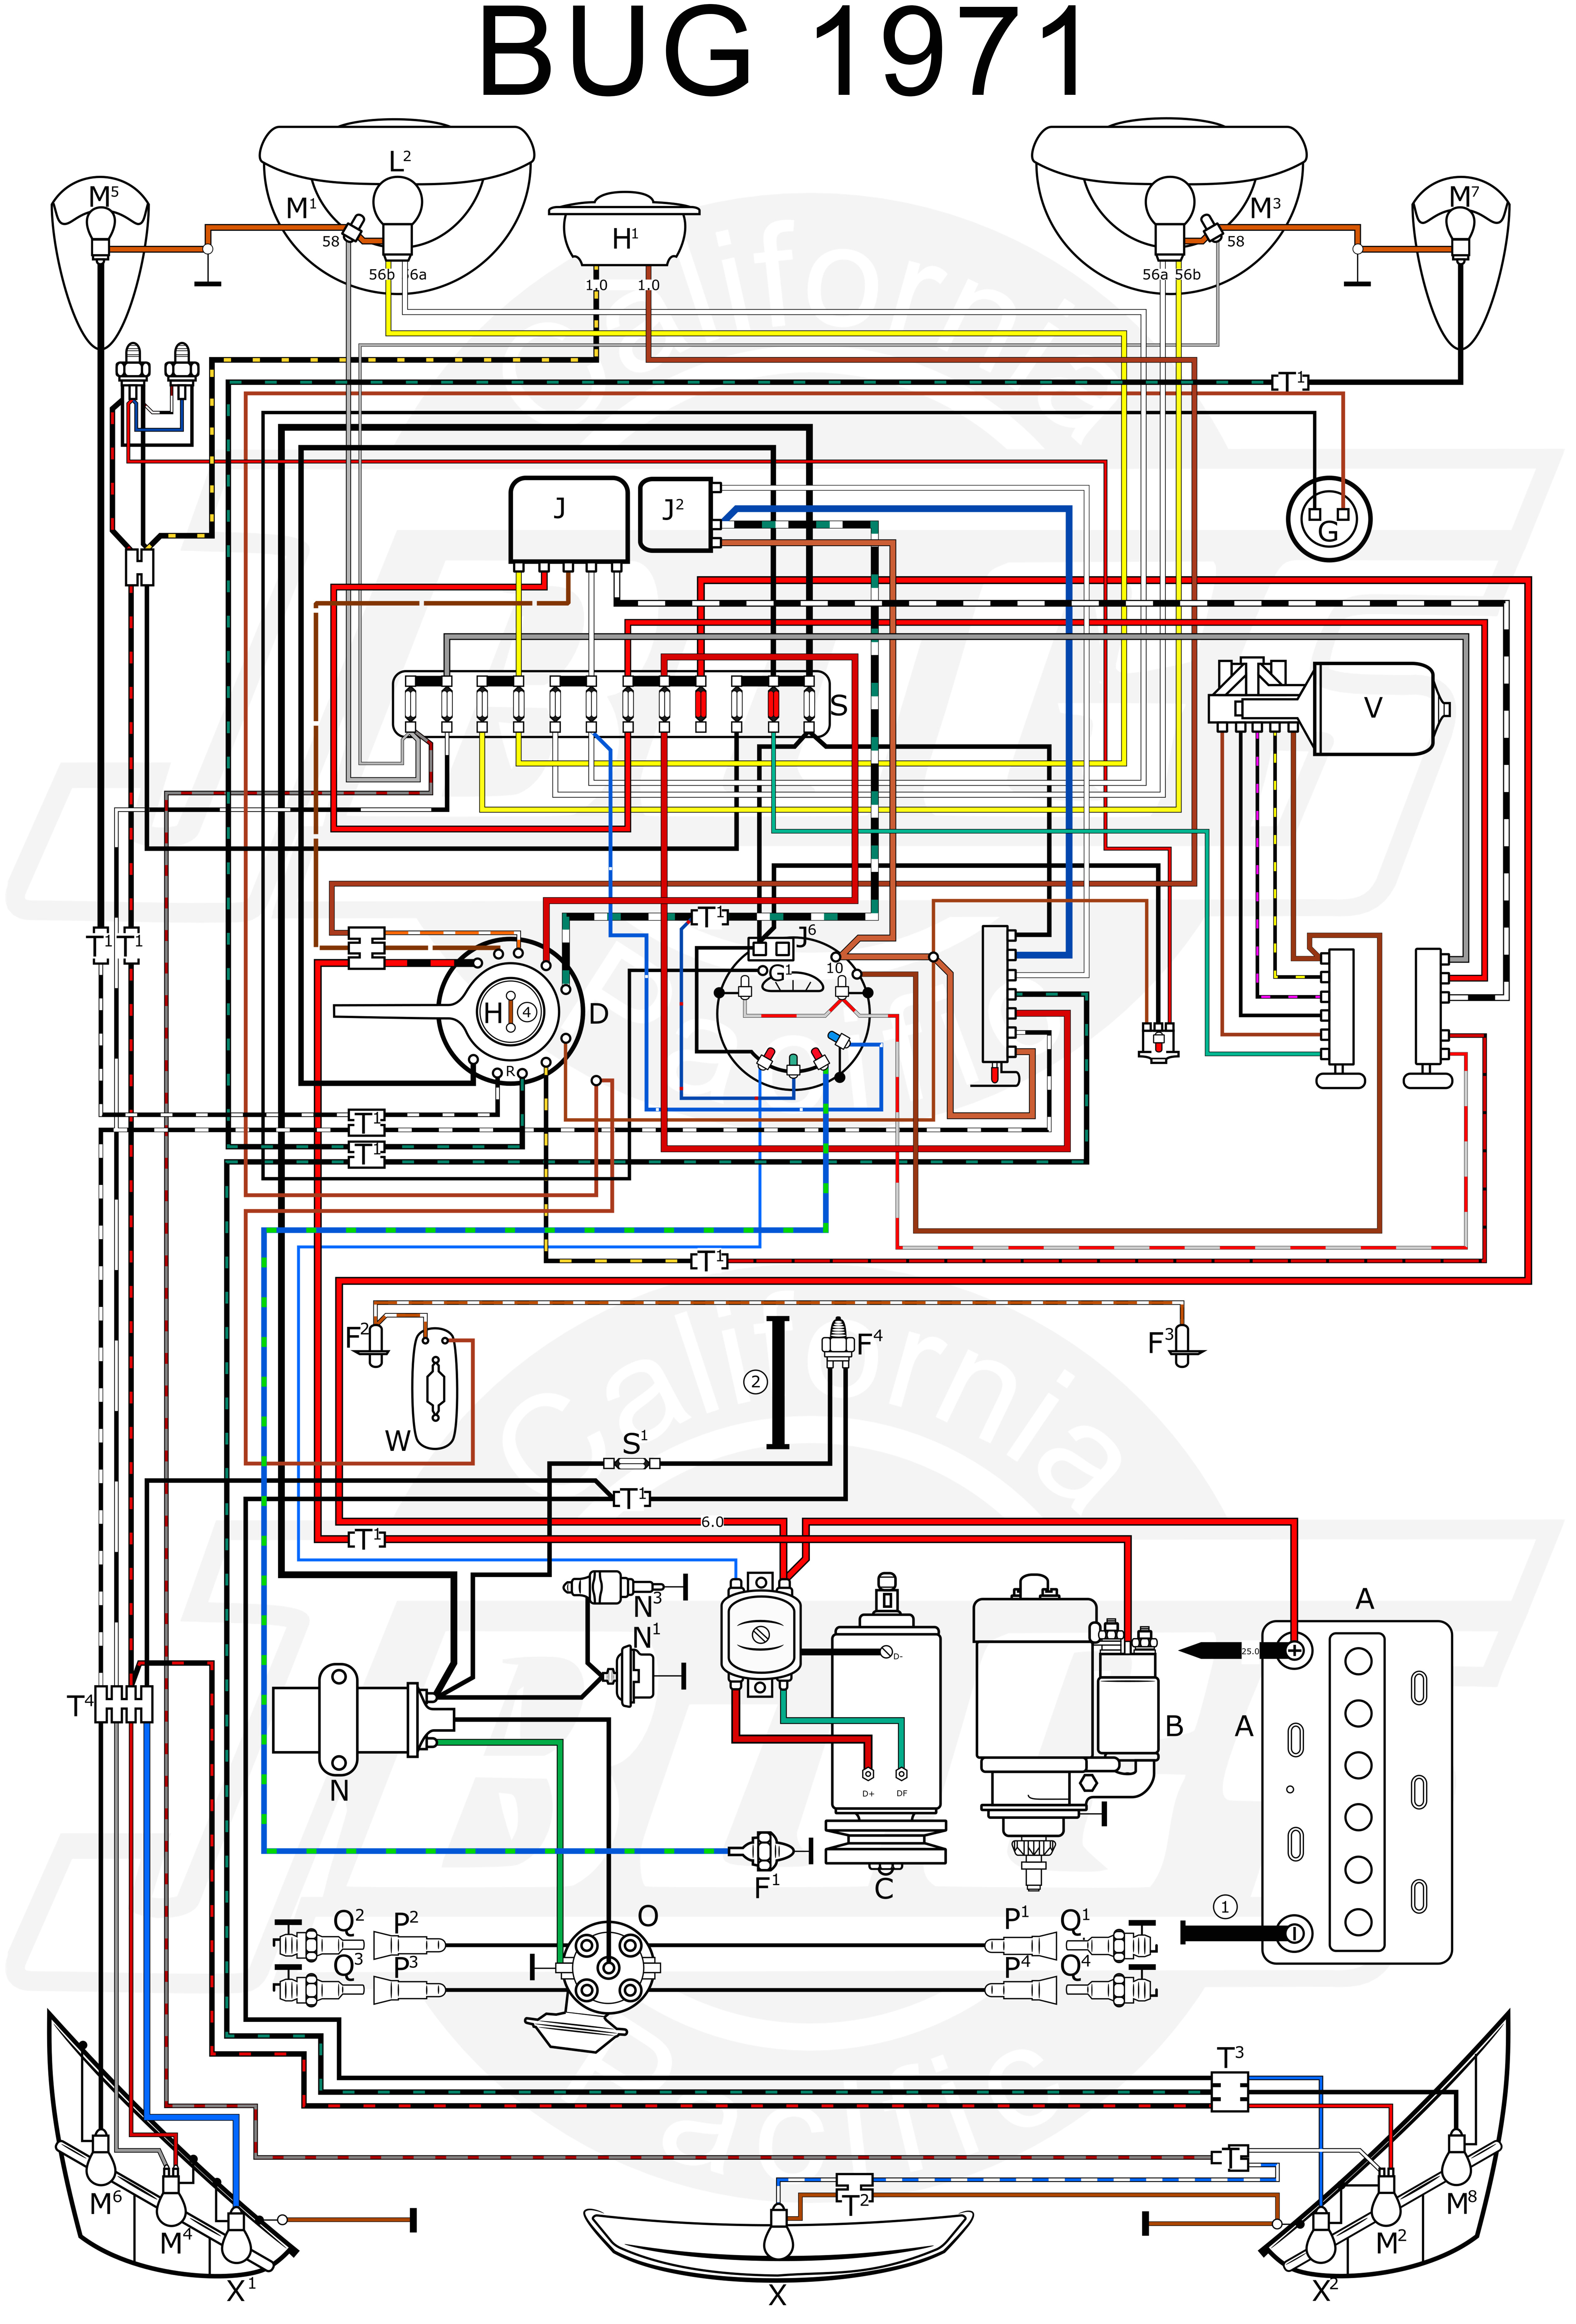 71 vw bus fuse box wiring diagram repair guides1971 vw fuse diagram wiring diagram for you